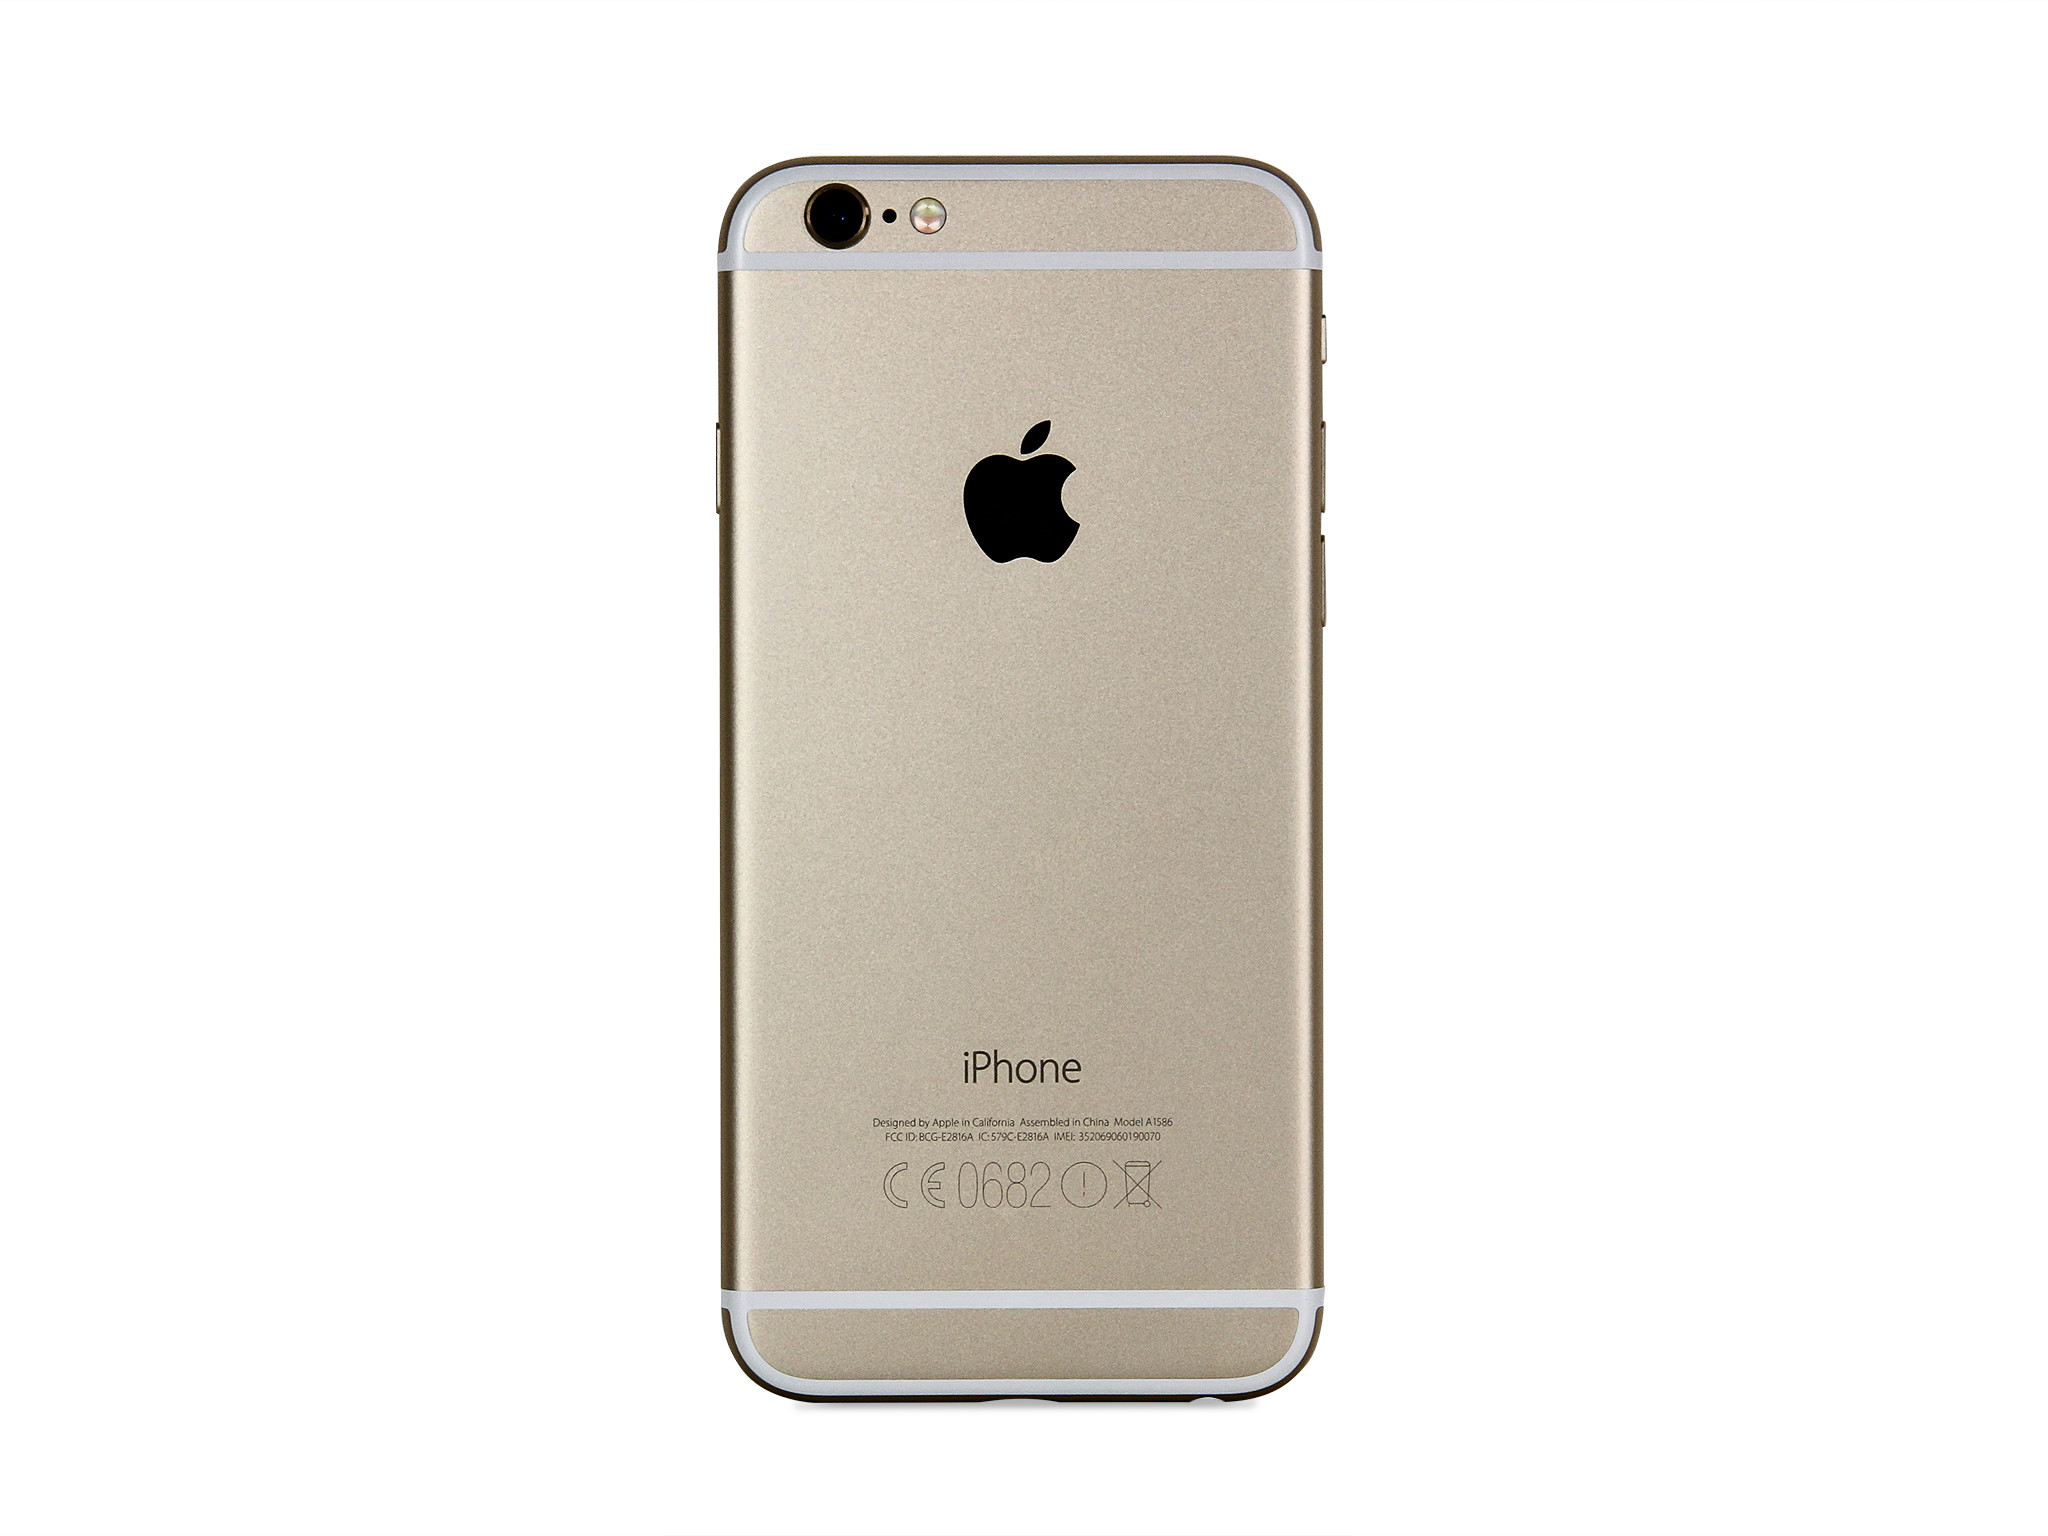 Iphone 6 Plus Gold Wallpaper 1080p HD